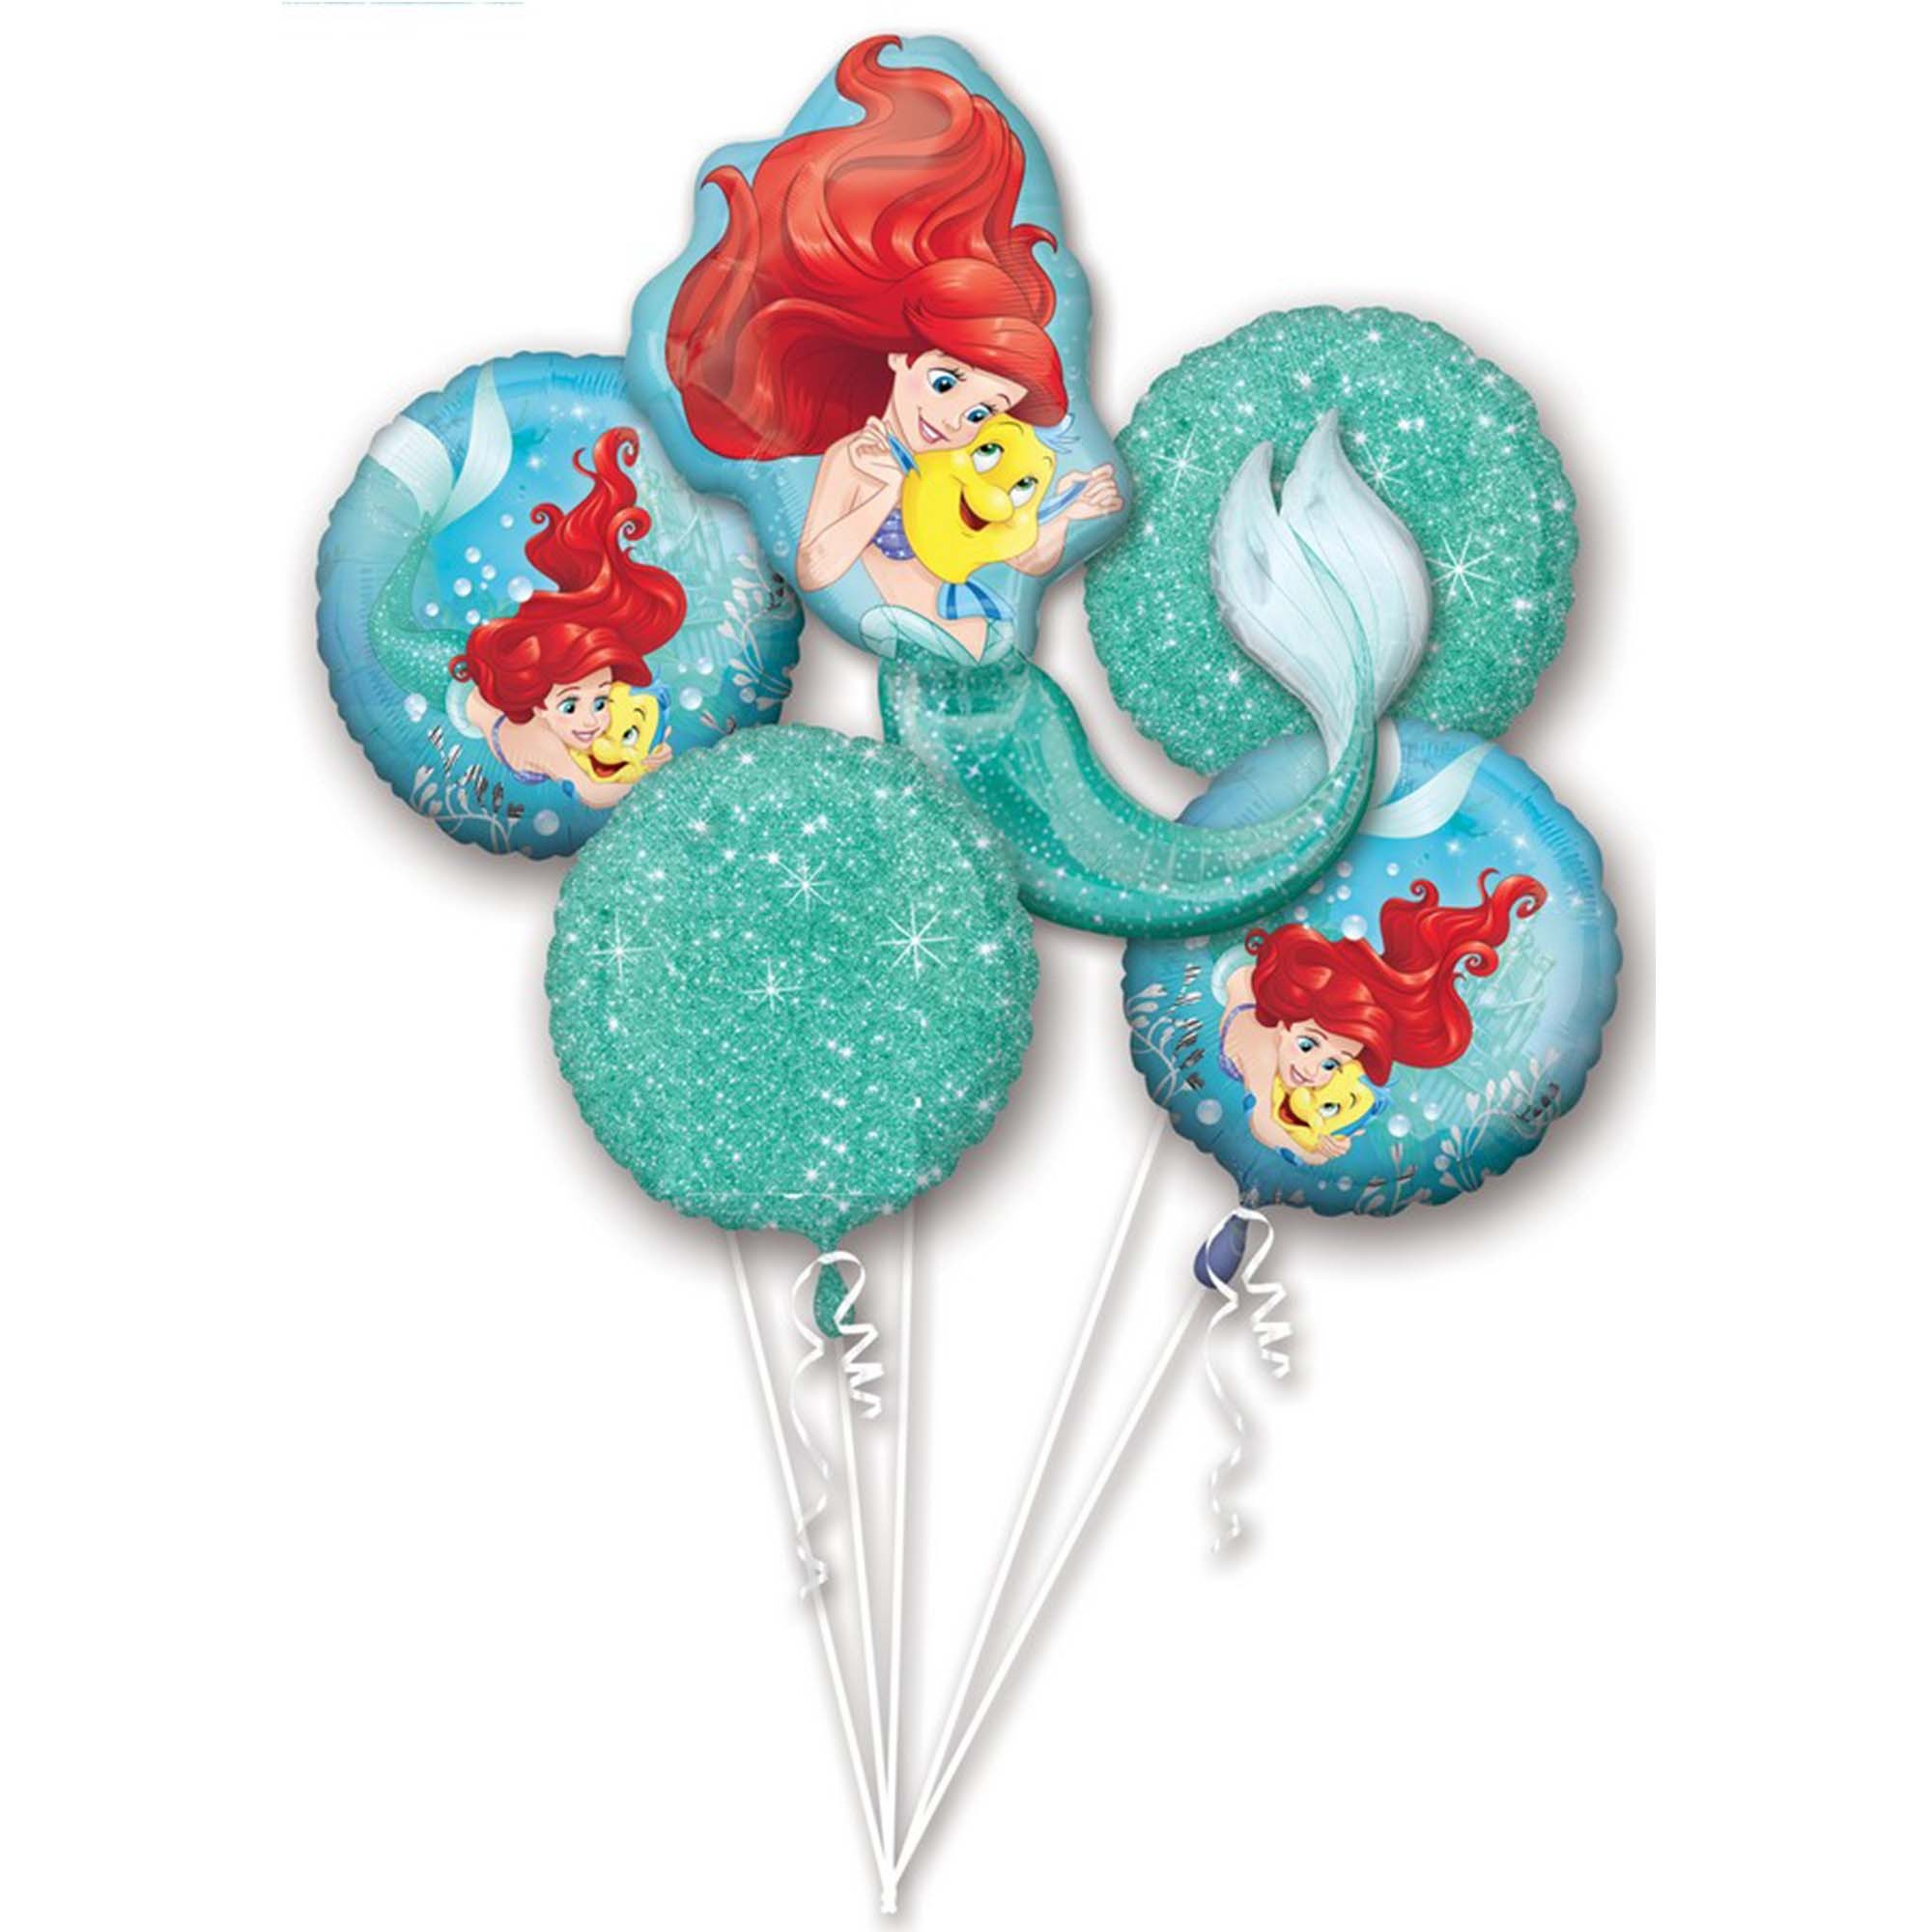 Bouquet Ariel Dream Big P75